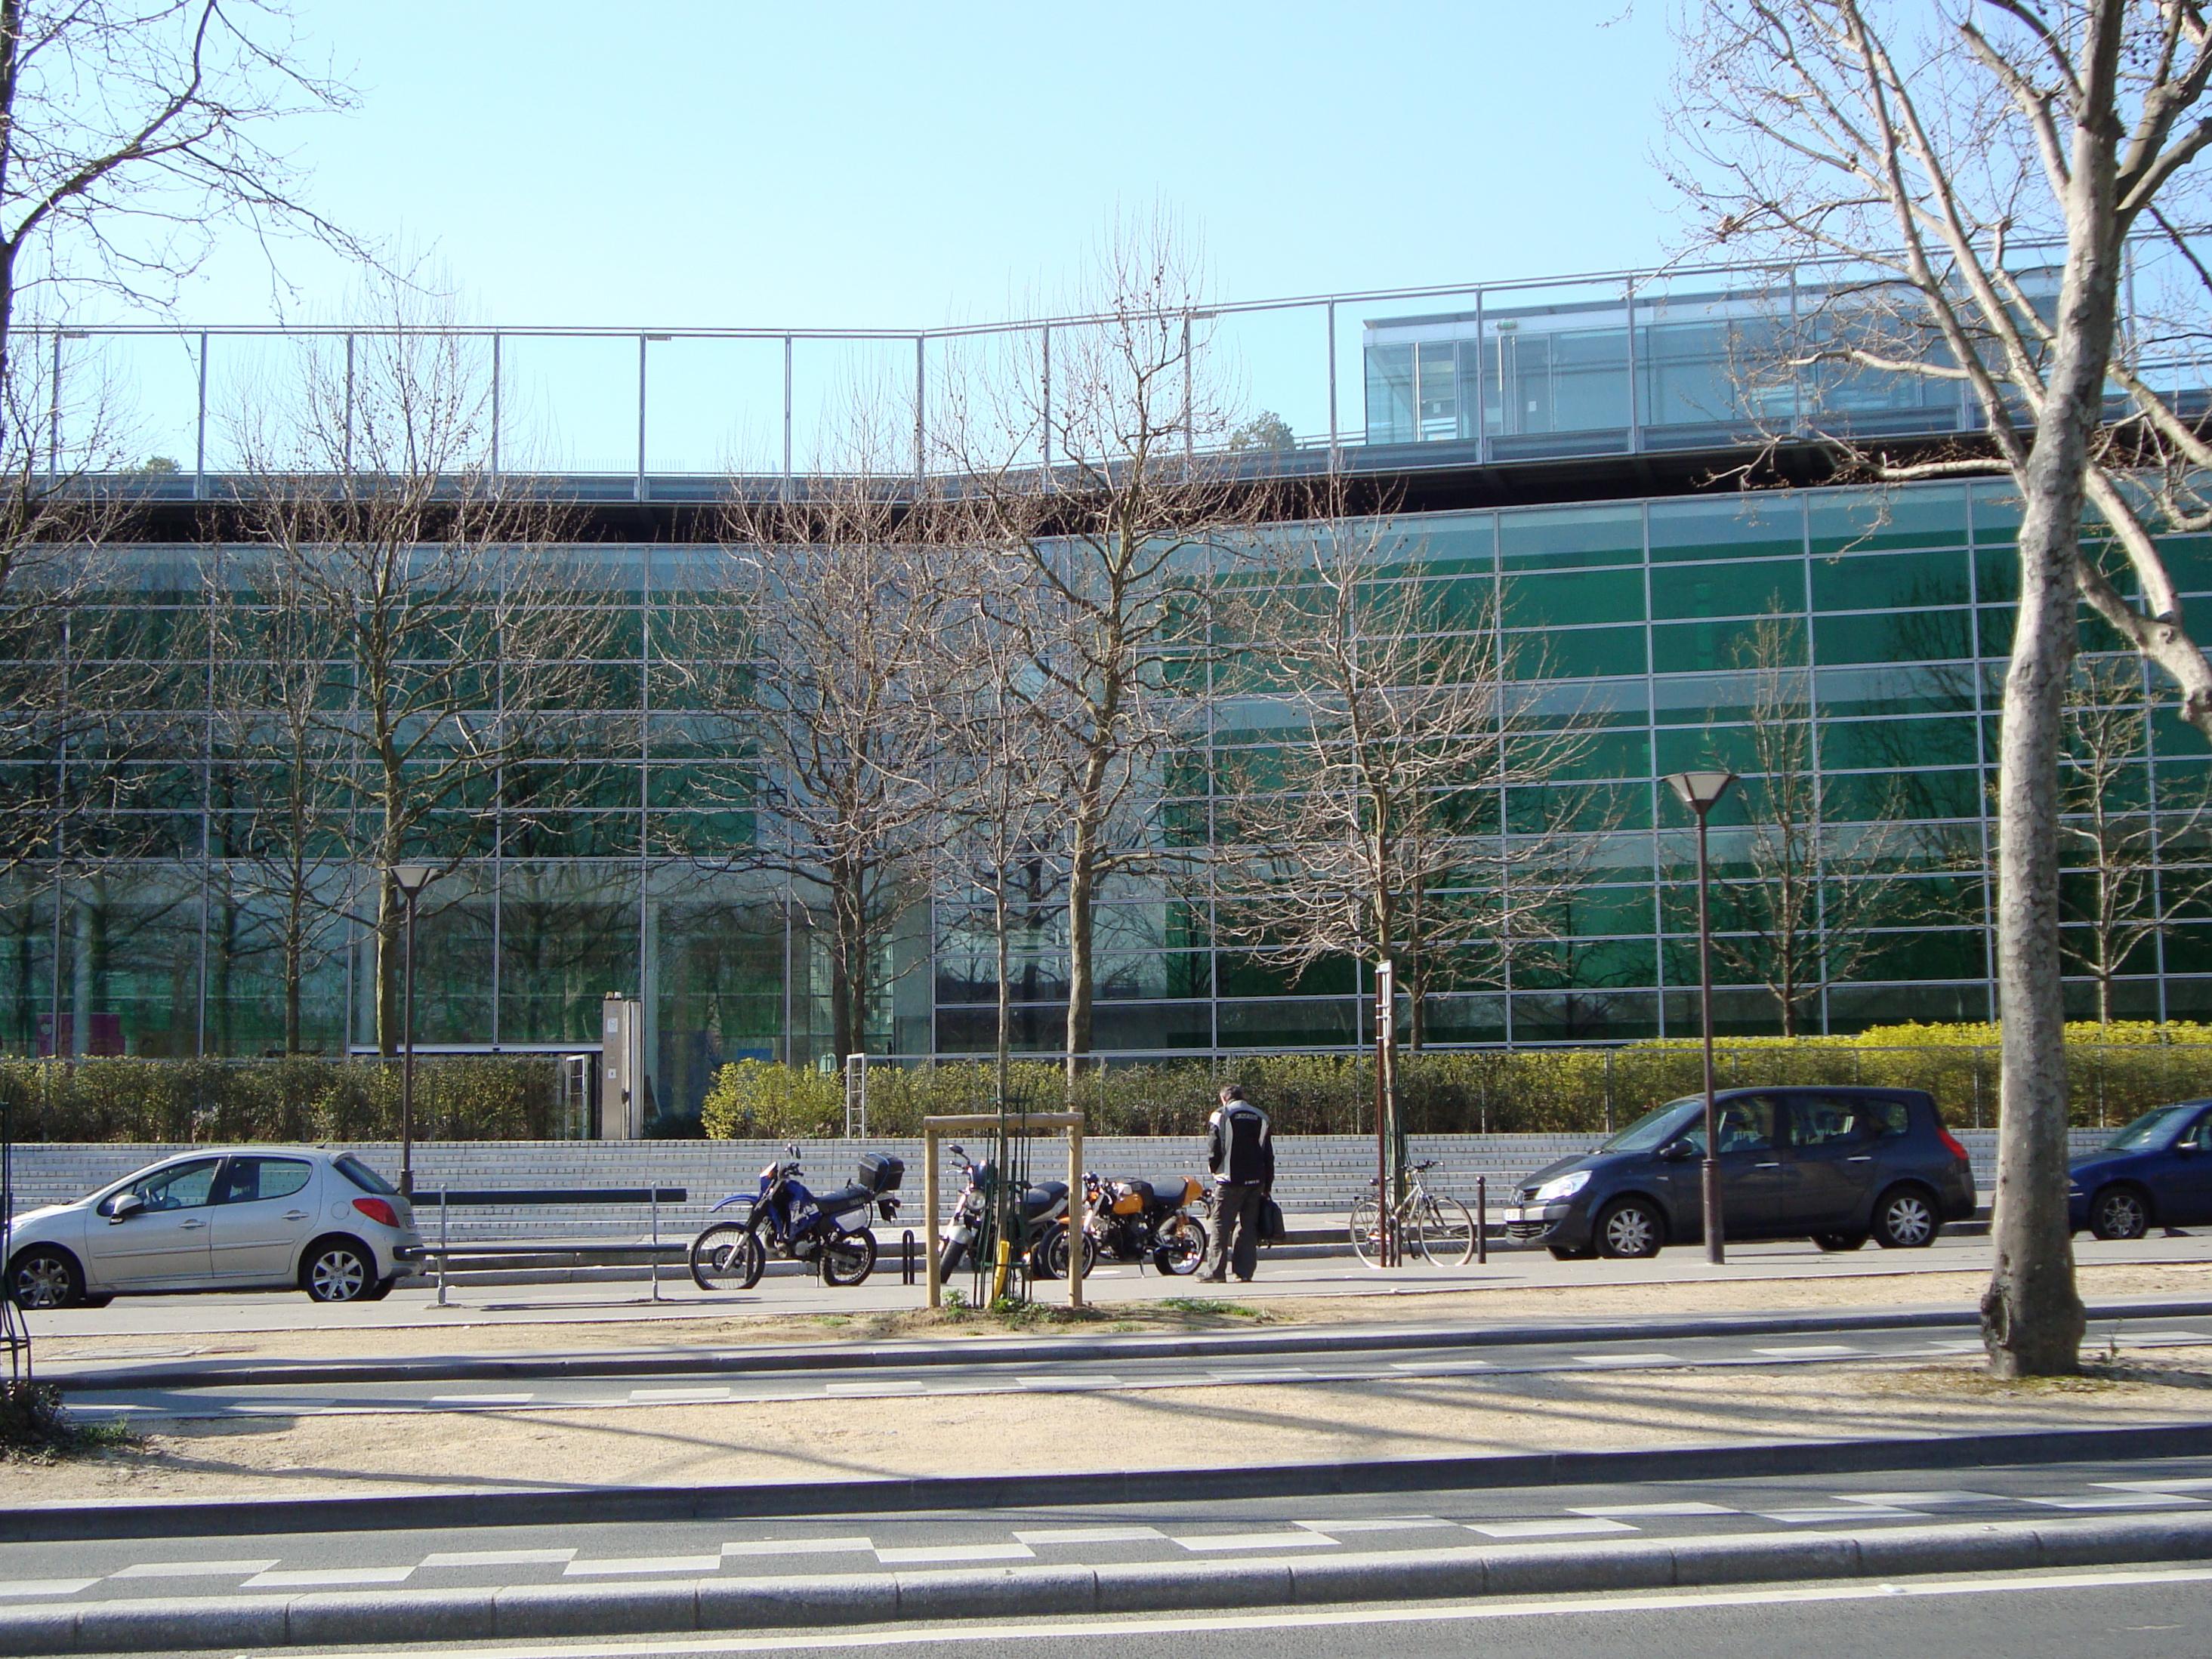 Fichier:Maison de Solene - Cochin.JPG — Wikipédia